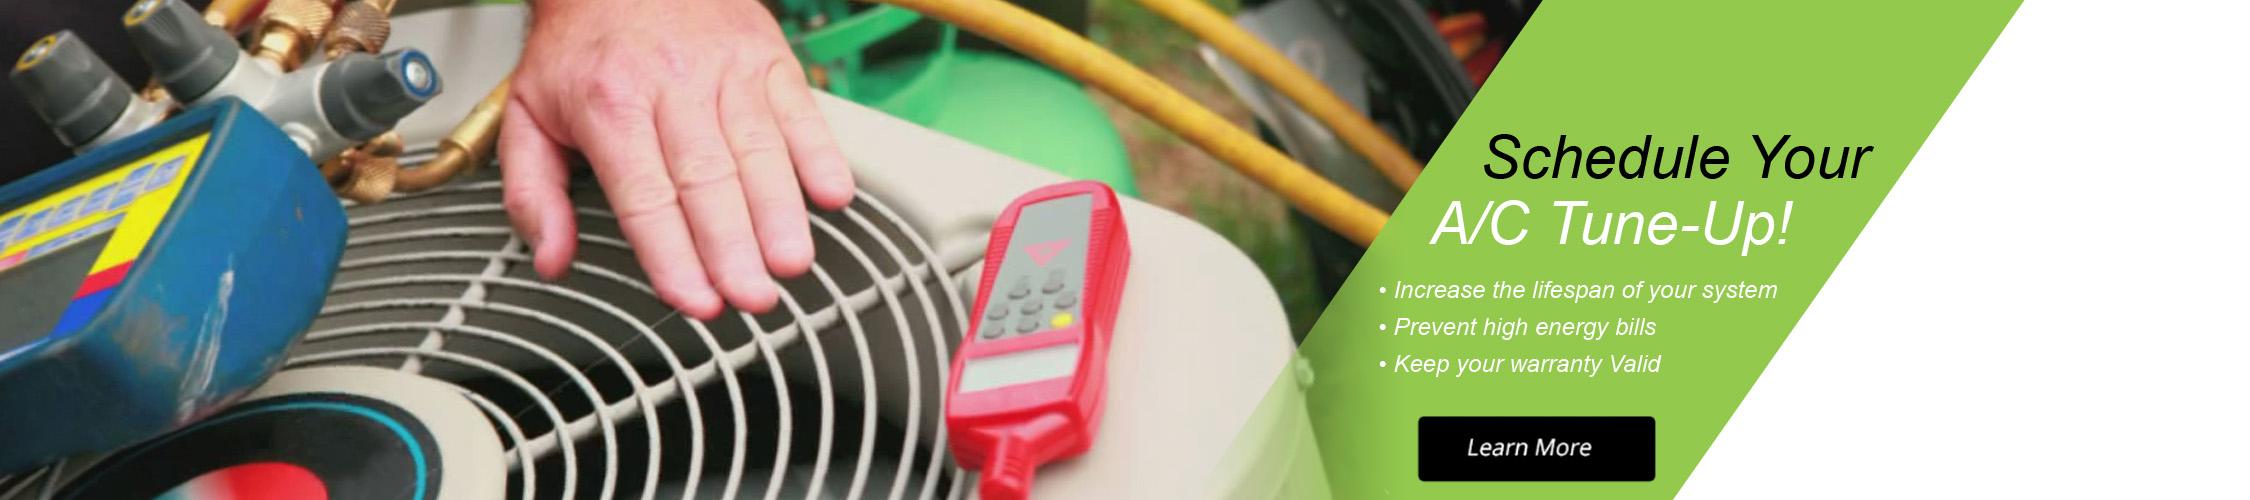 Air Conditioner Tuneup